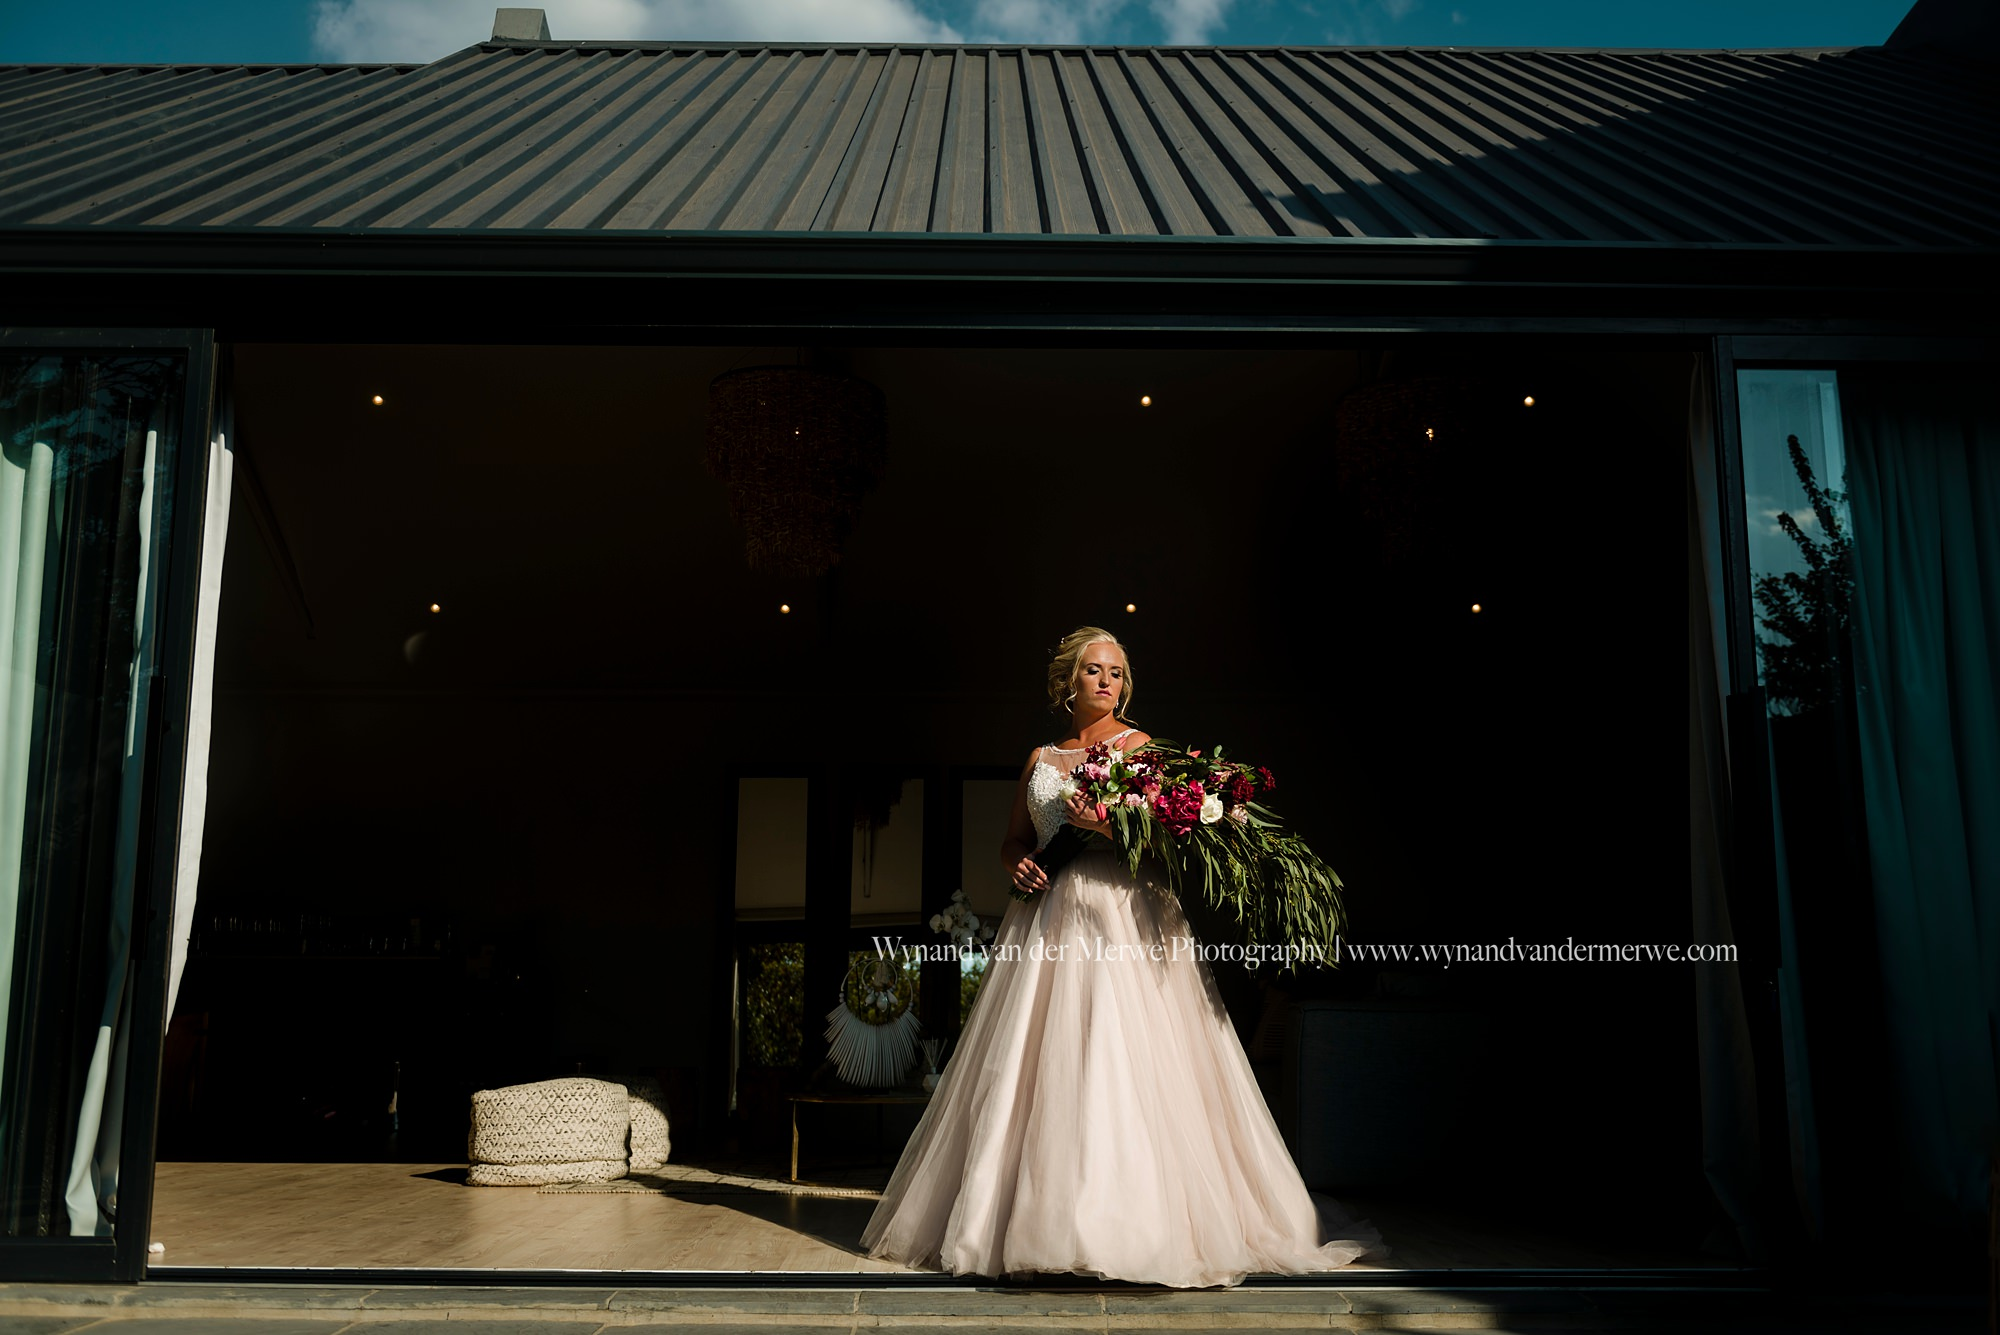 Wynandvandermerwe marcel zandrie wedding goregous inimitable wedding venue gauteng-14.jpg